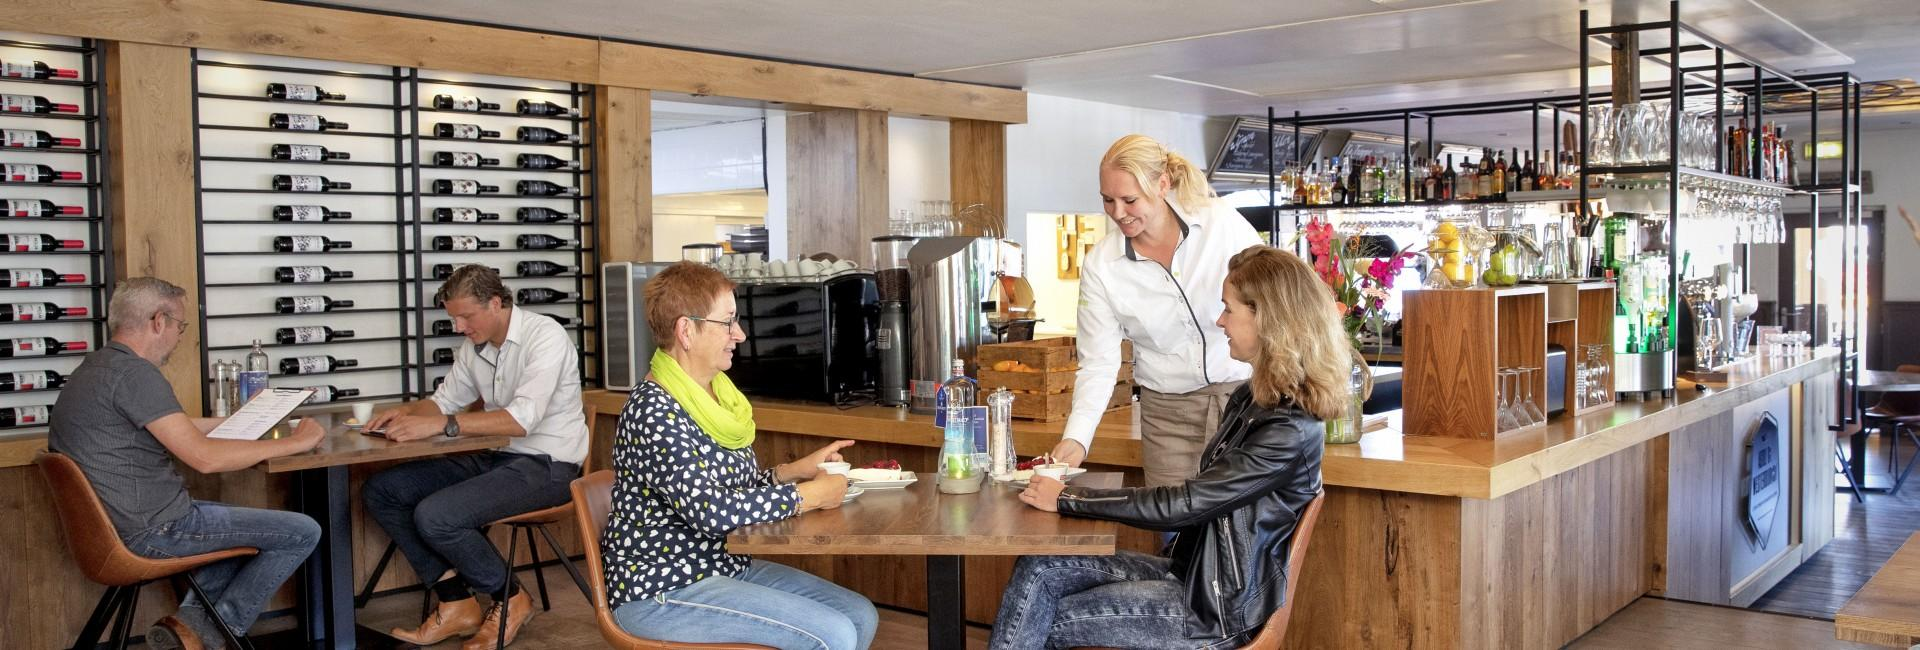 Hotel   Restaurant   Wellness   Terrasse